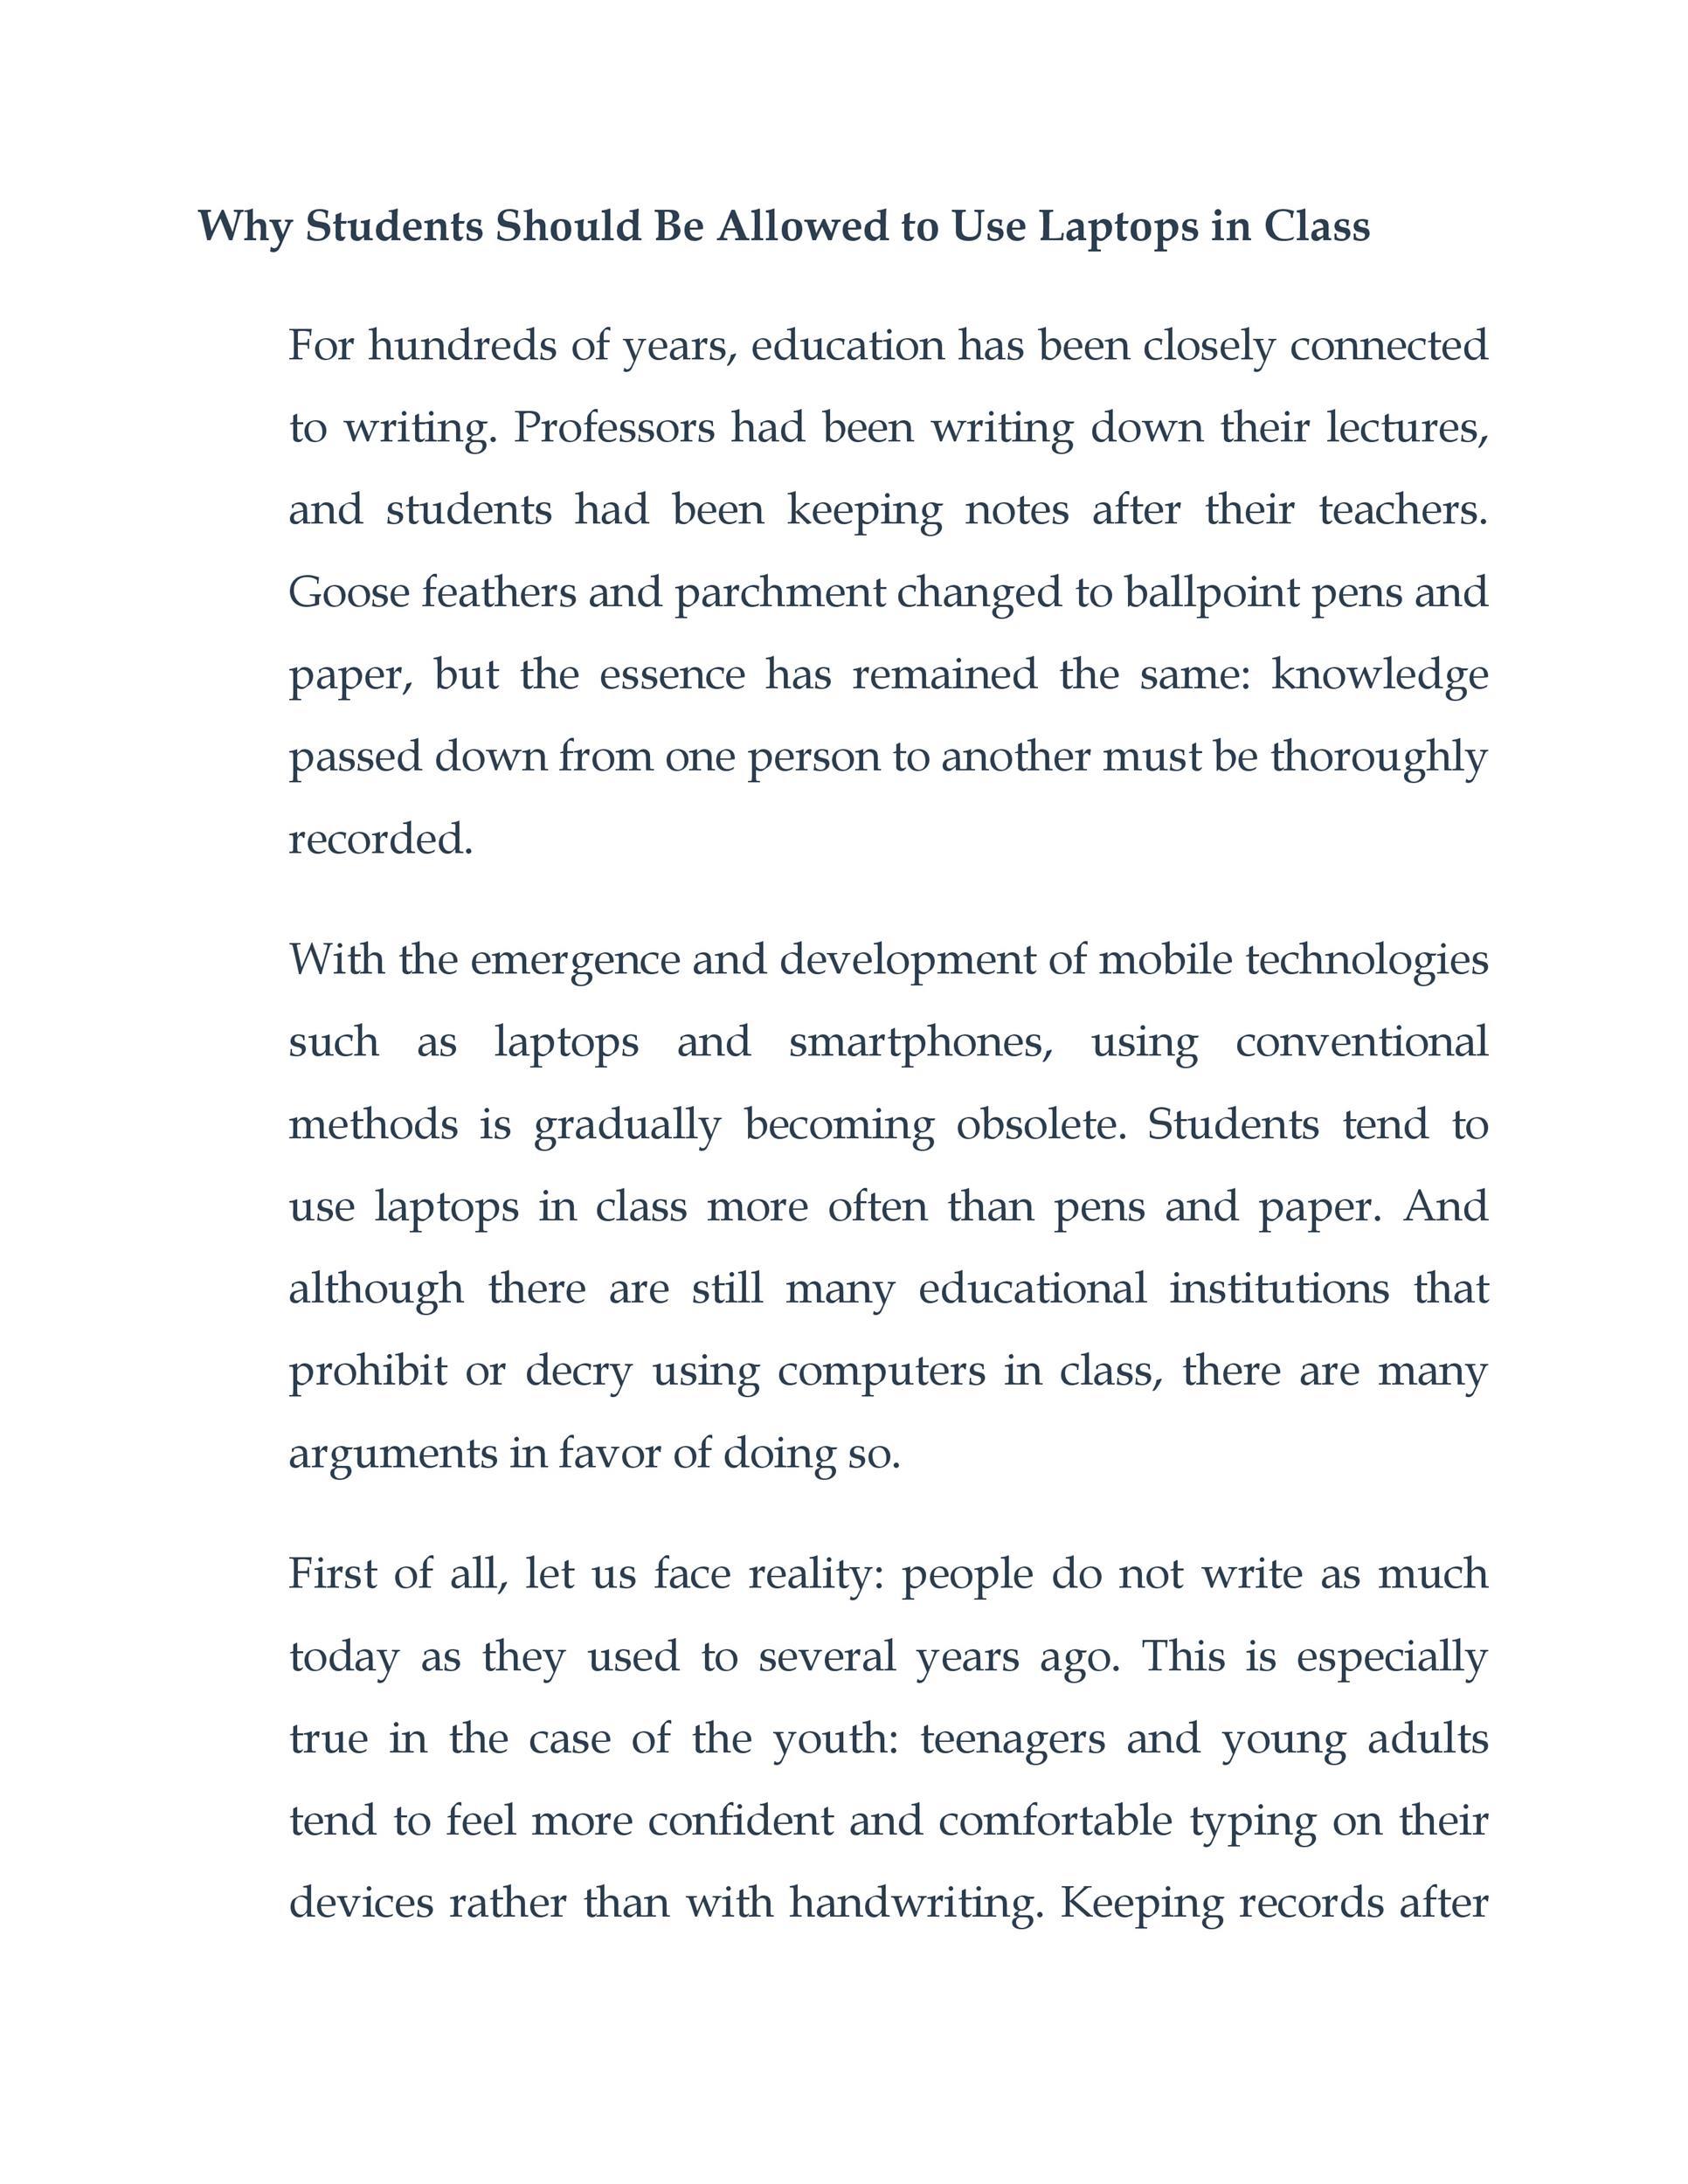 Free persuasive essay example 46